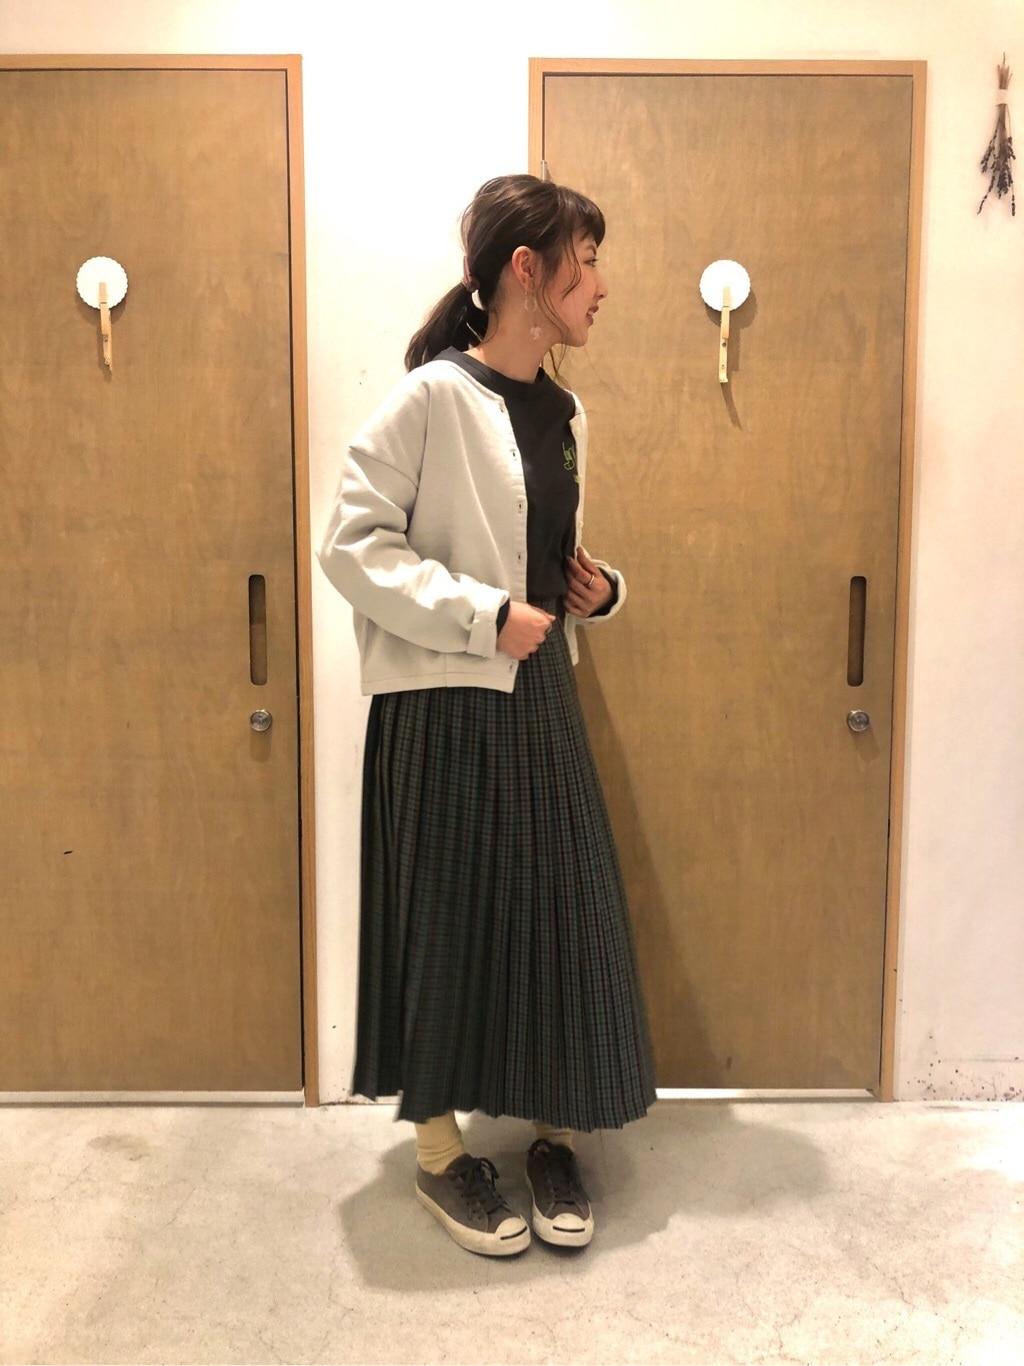 bulle de savon トリエ京王調布 身長:155cm 2019.11.22